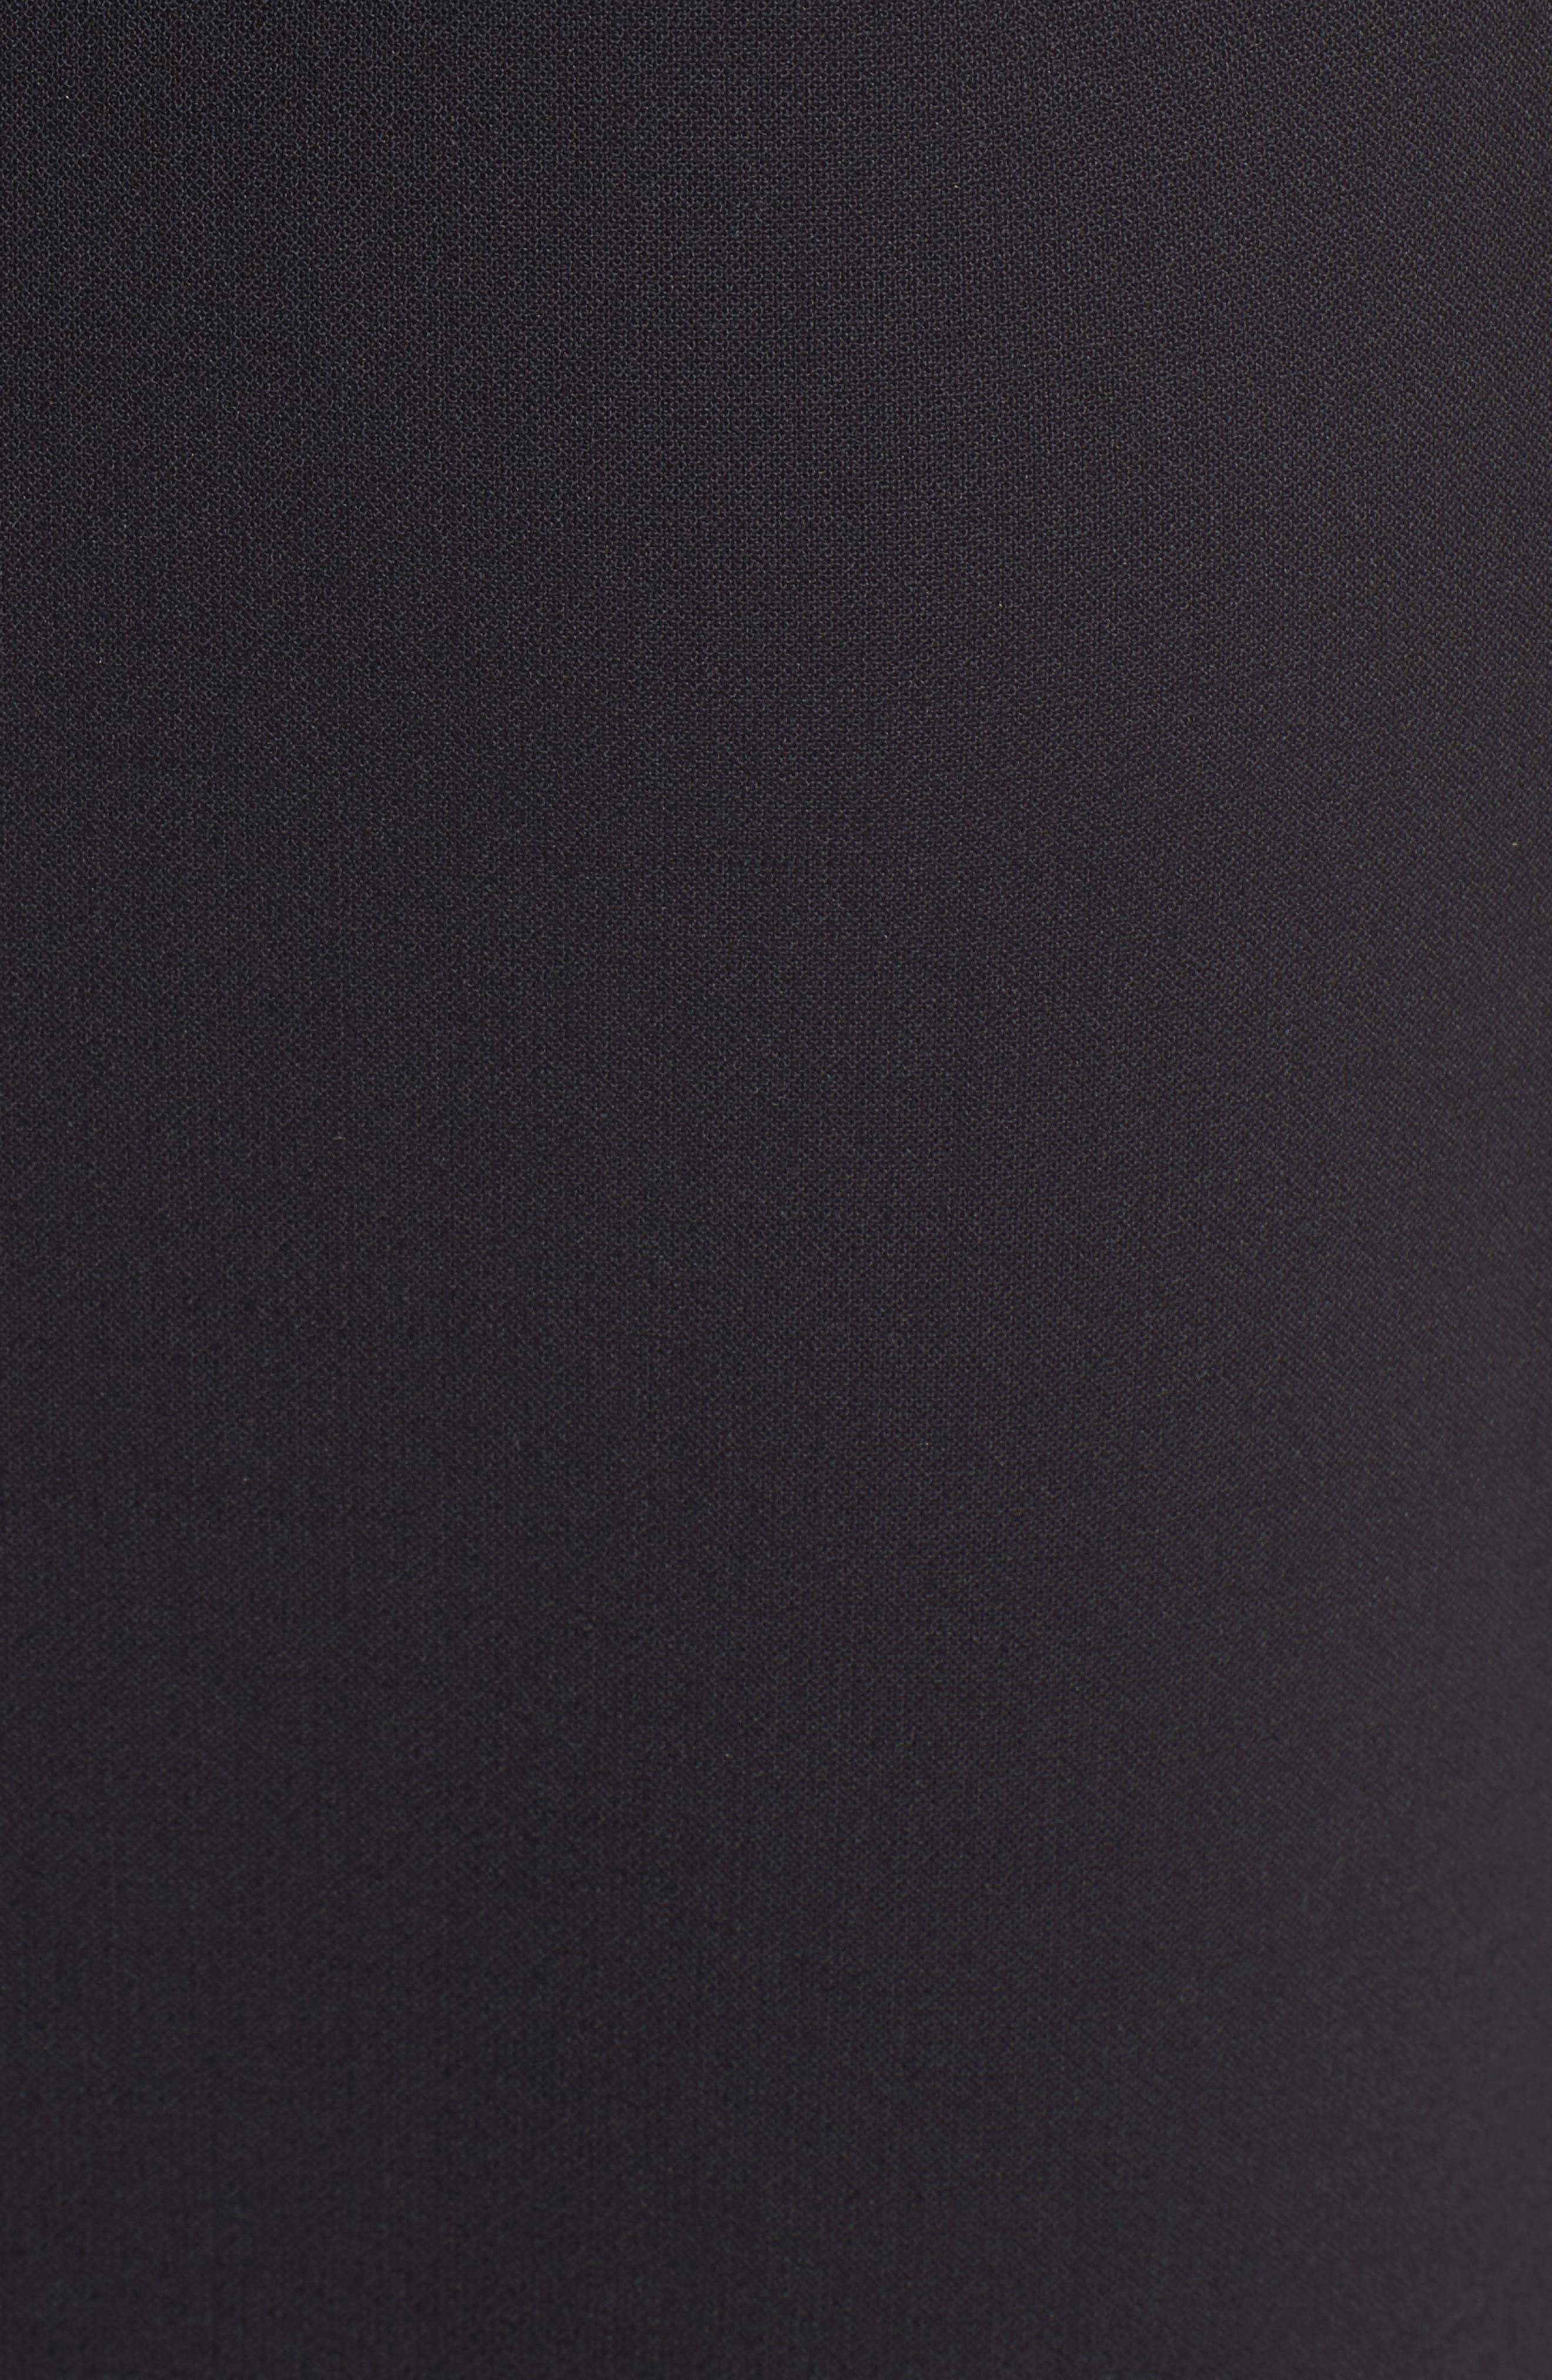 Corset Detail Stretch Wool Sheath Dress,                             Alternate thumbnail 5, color,                             Black